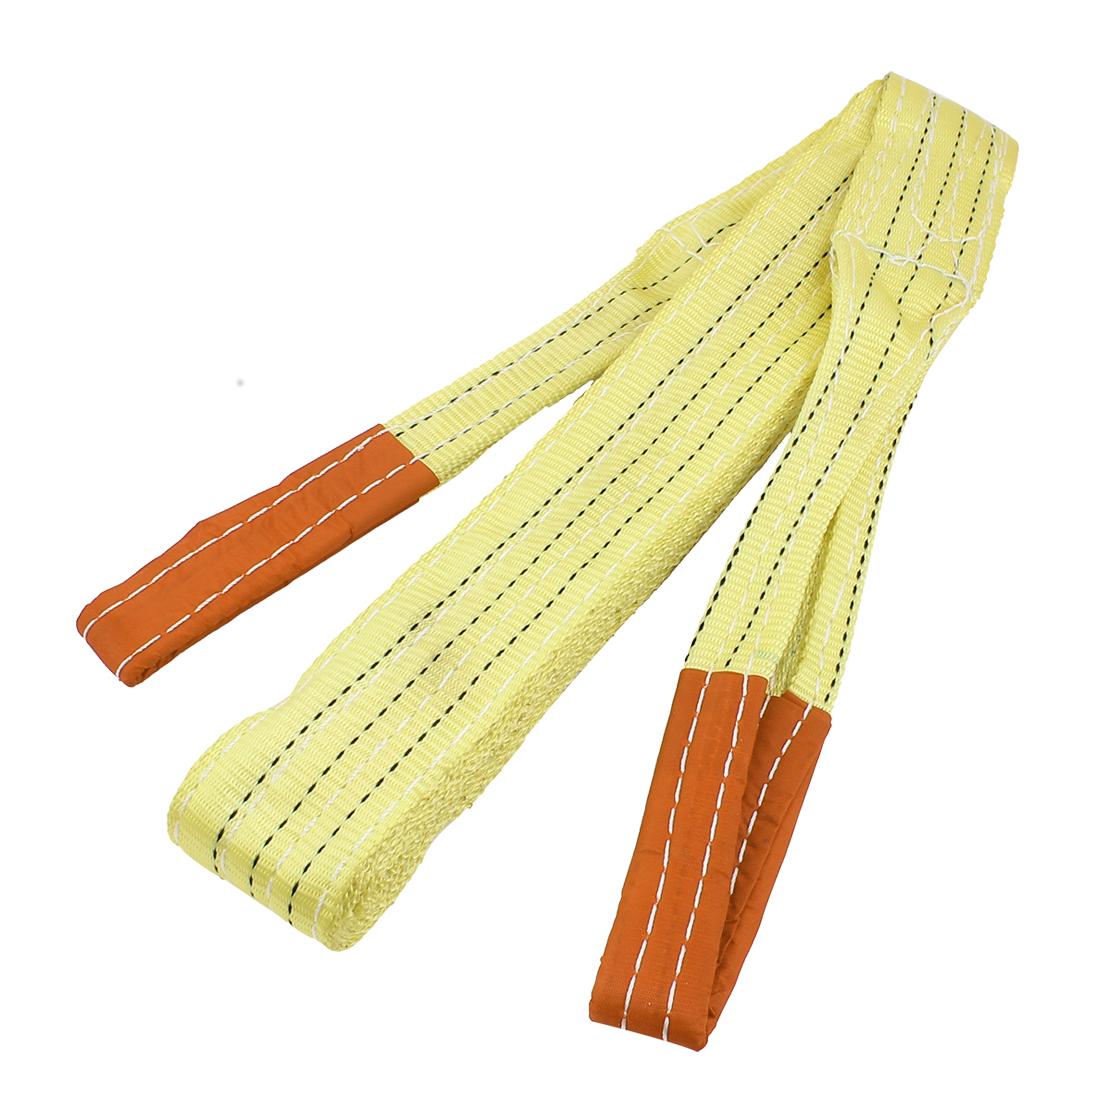 3 Meter 75mm Width Eye to Eye Nylon Web Lifting Tow Strap Yellow